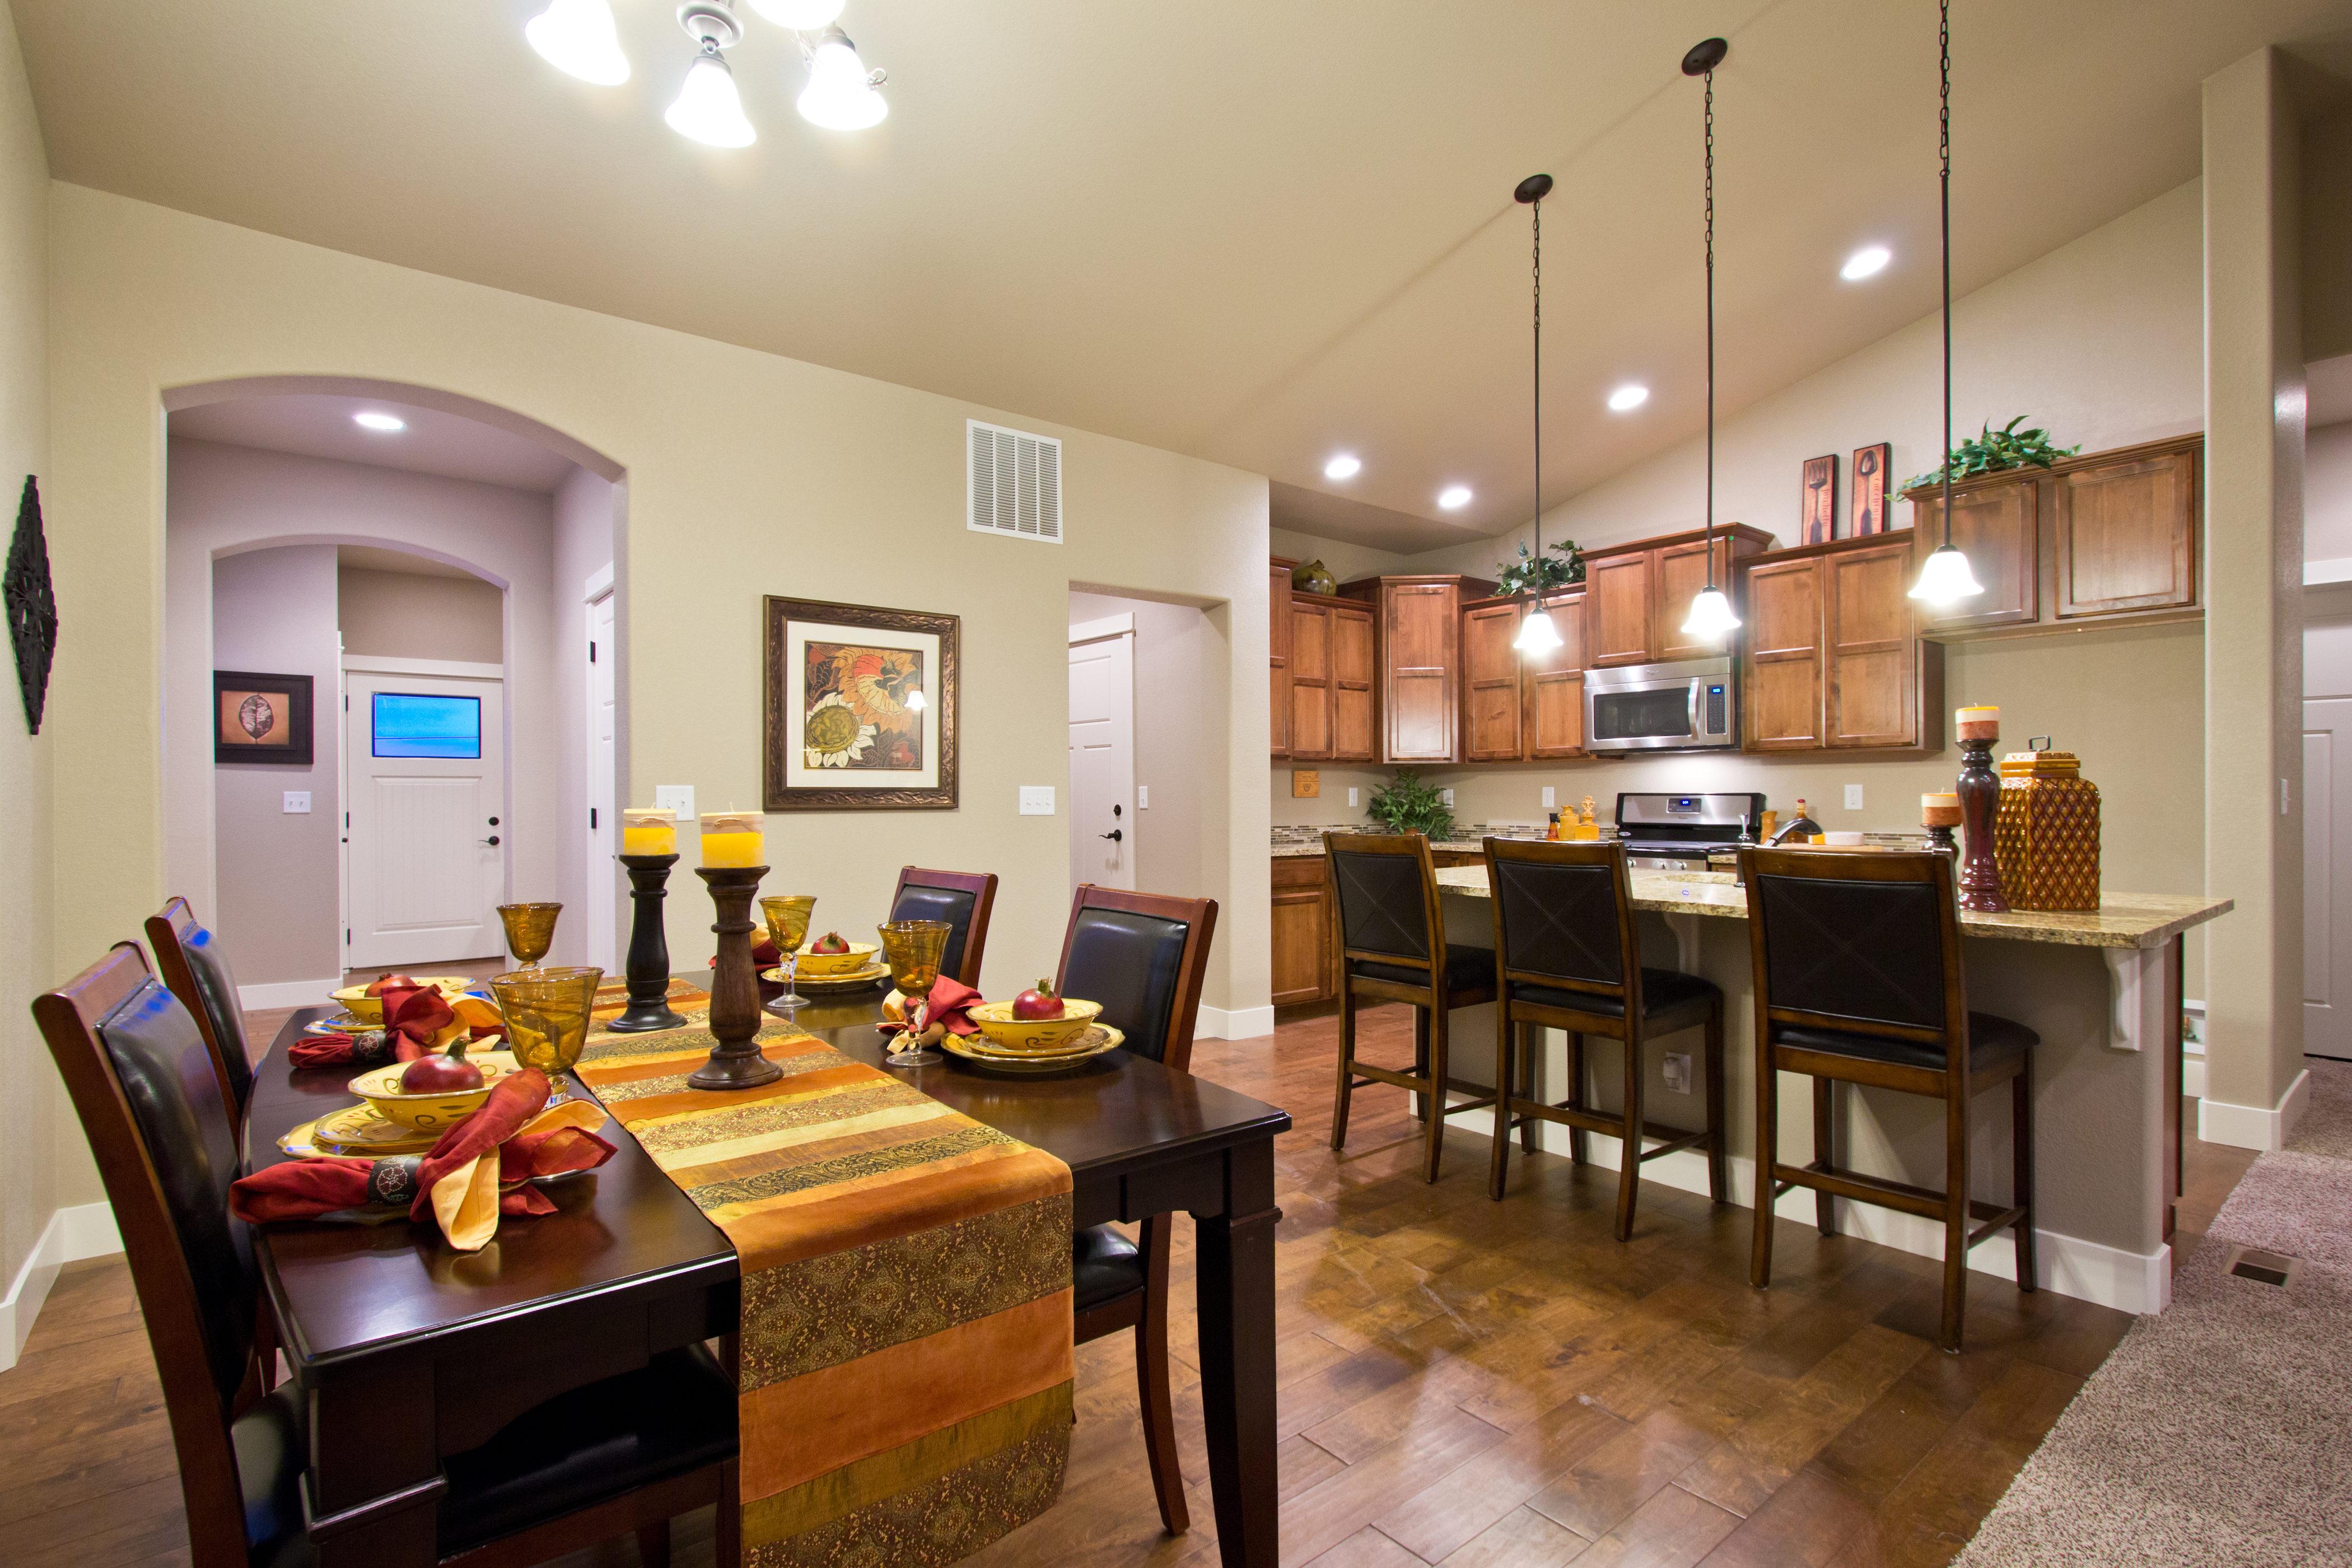 14_durango_loveland_kitchen-dining_new_20house